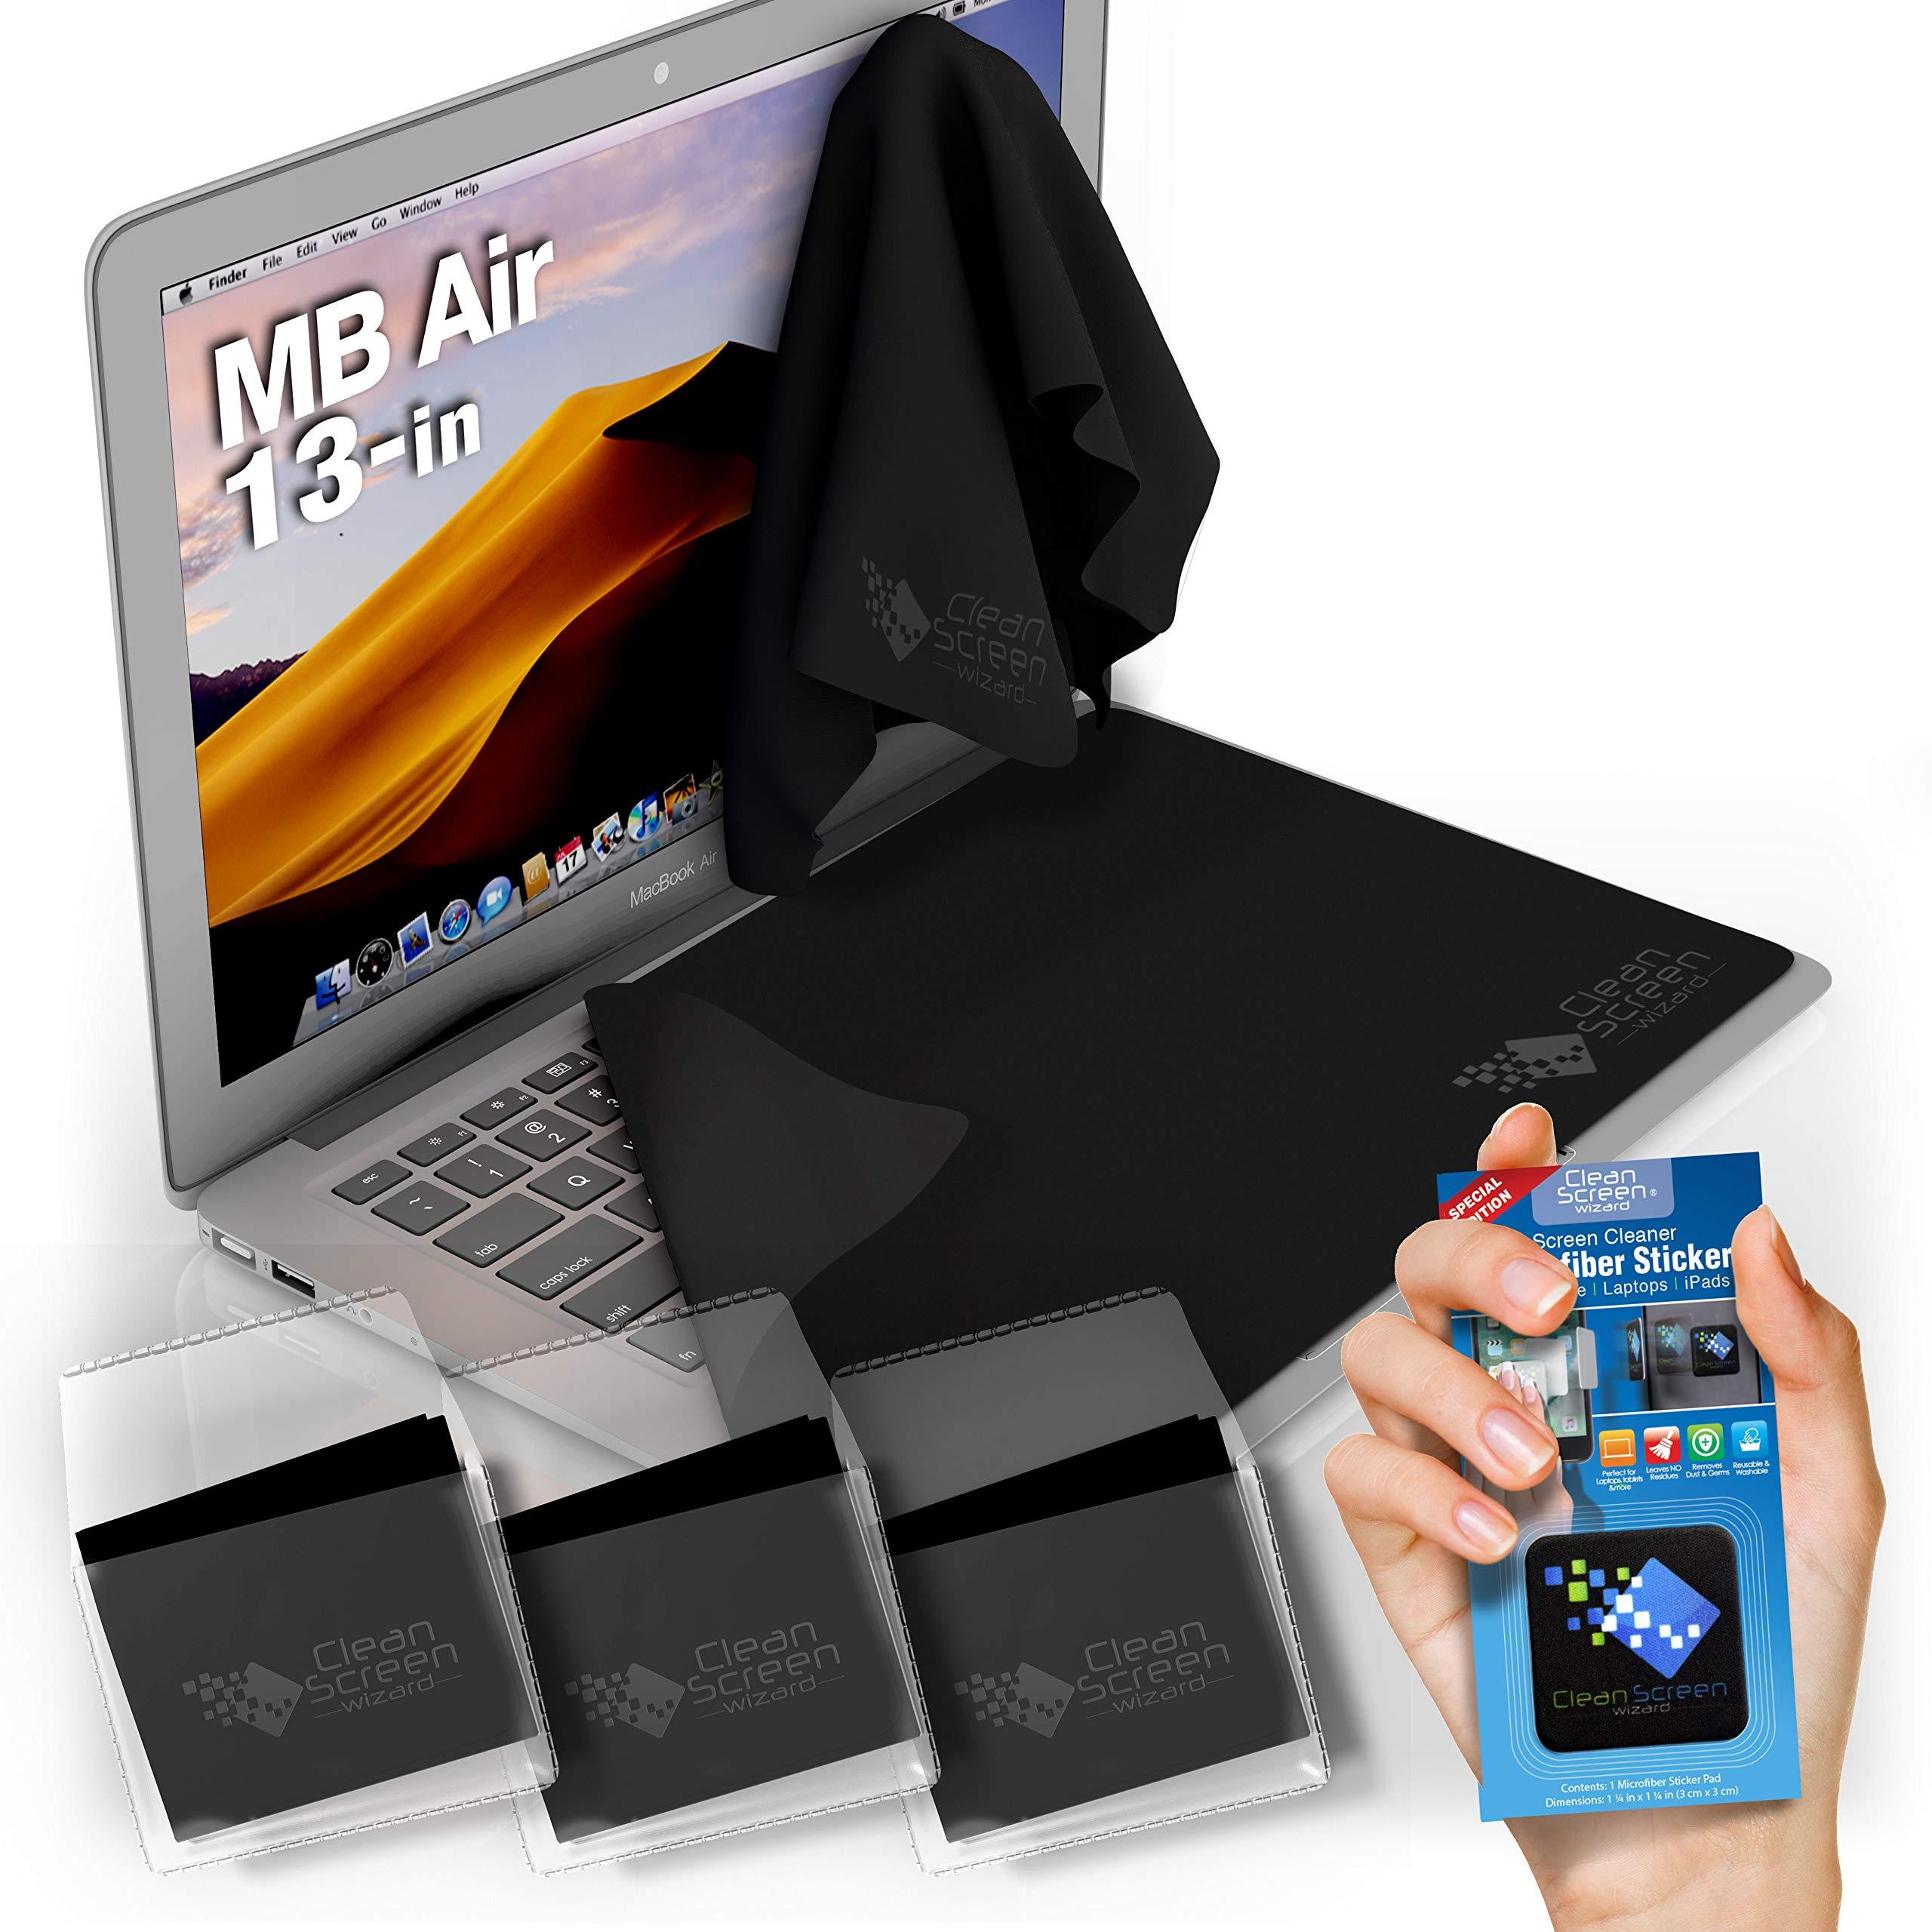 CLEAN SCREEN WIZARD Microfiber Cloths Screen Keyboard Covers/Screen Keyboard Protectors Cleaners for MacBook Air 13'', 4 PCS Bundle (Black)